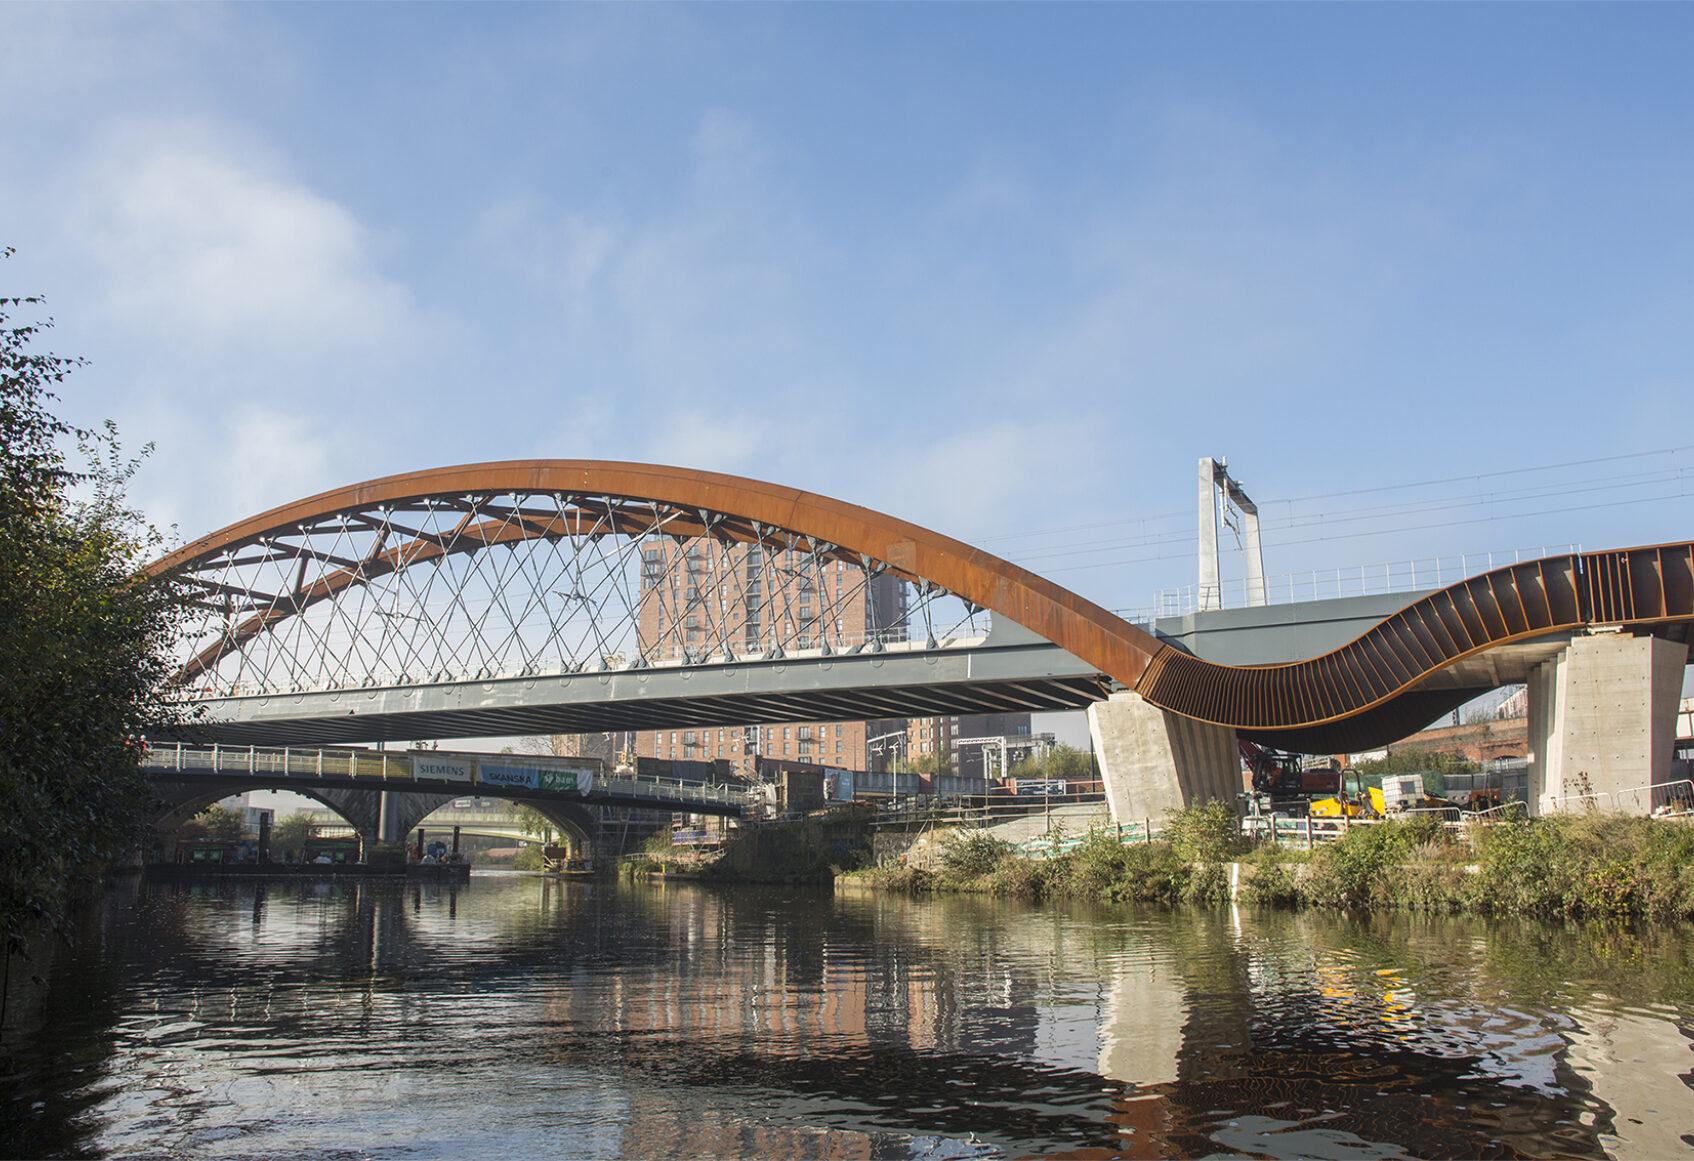 View of rail bridge crossing the River Irwell